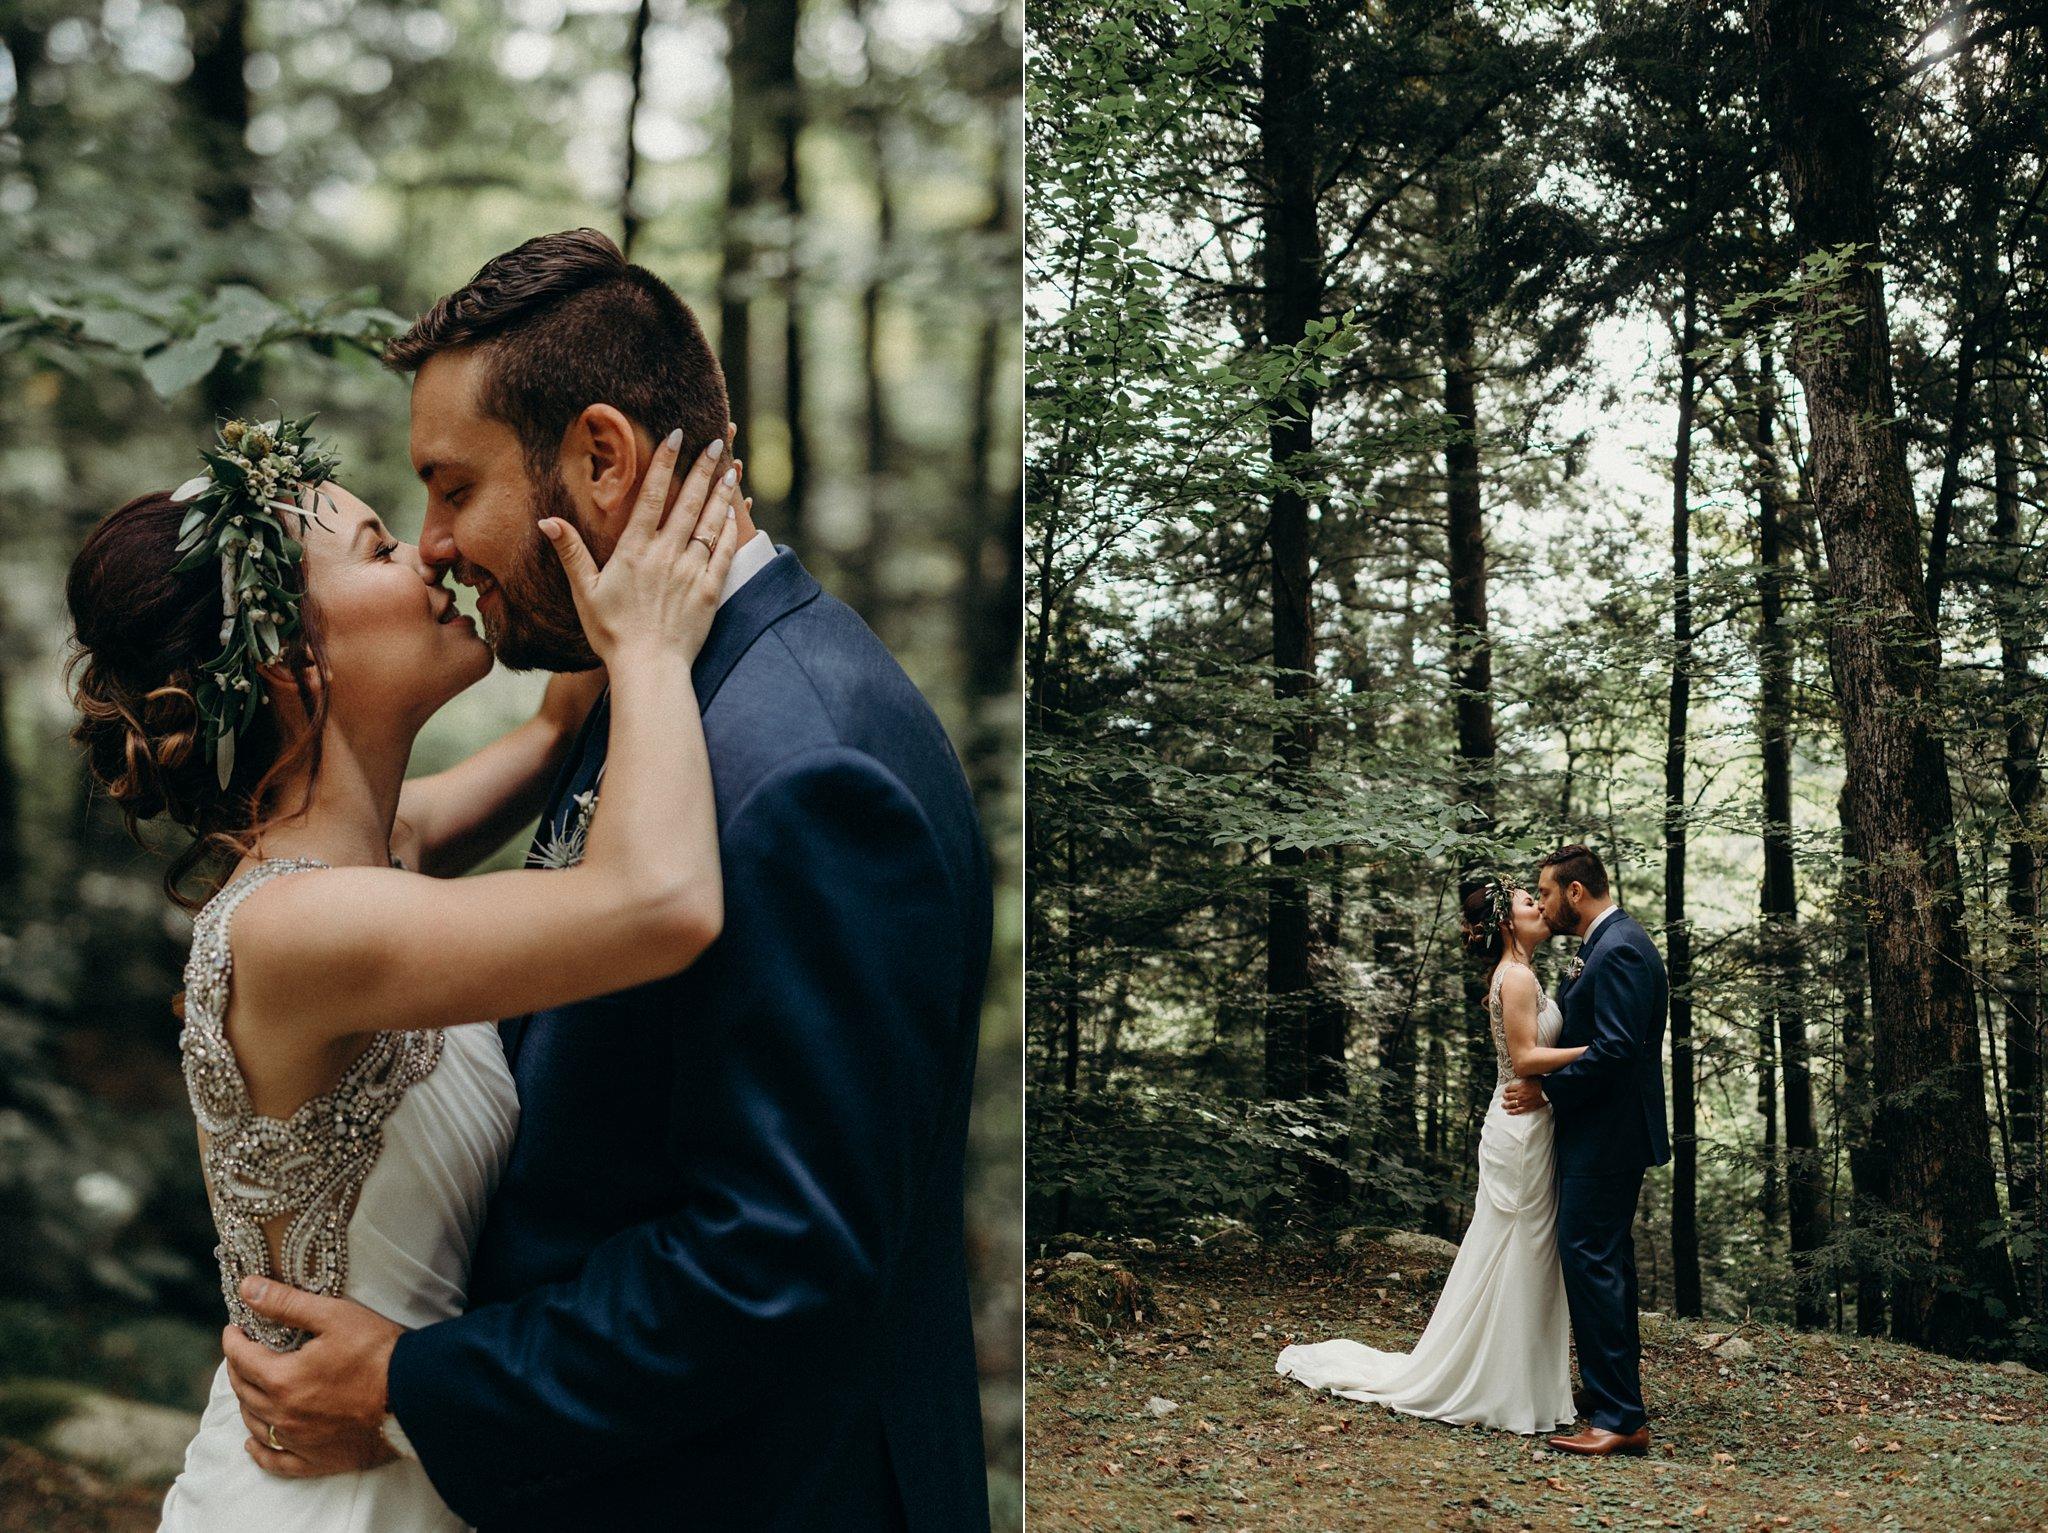 kaihla_tonai_intimate_wedding_elopement_photographer_6587.jpg